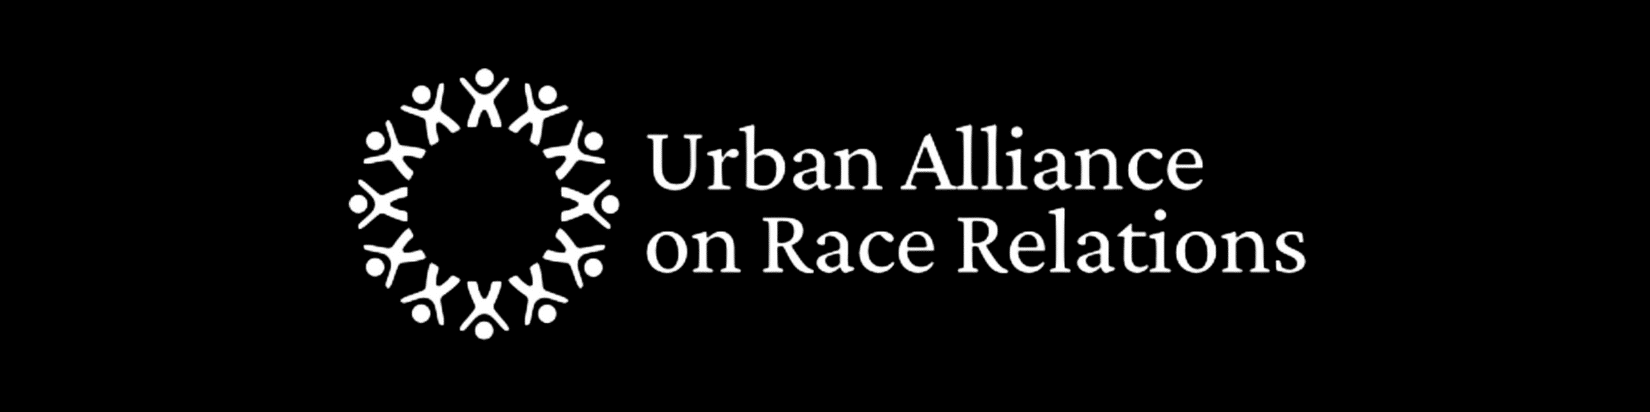 UARR Logo banner